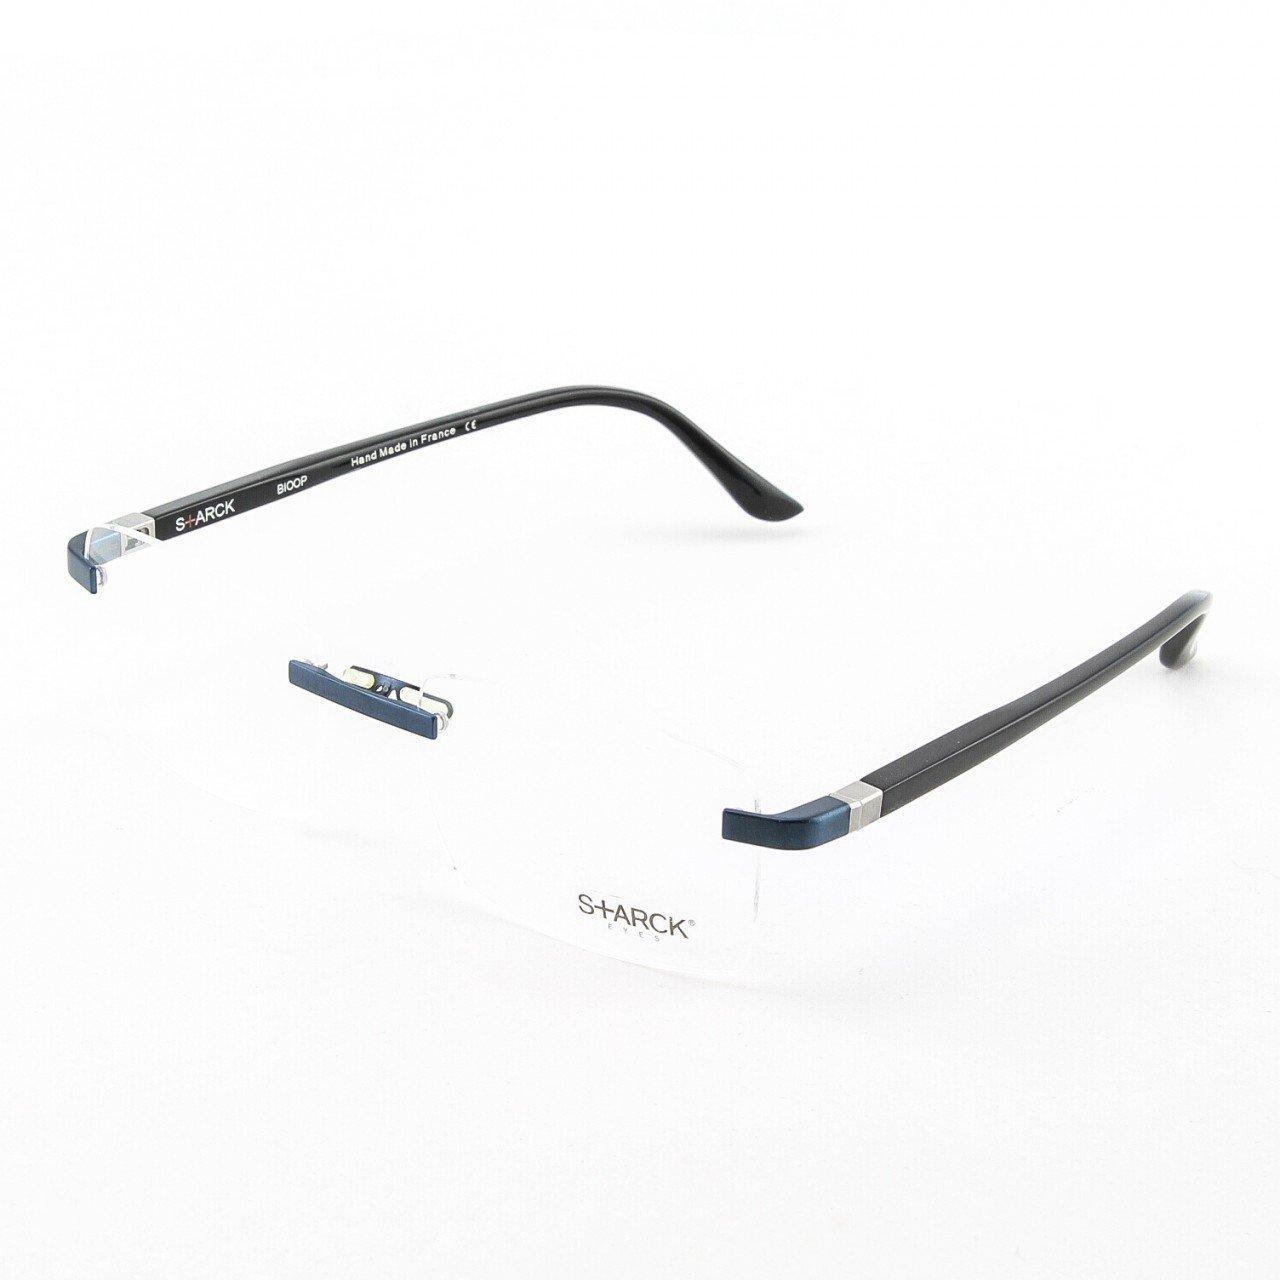 Starck Eyeglasses PL1023 Col. 0008 Black with Clear Lenses